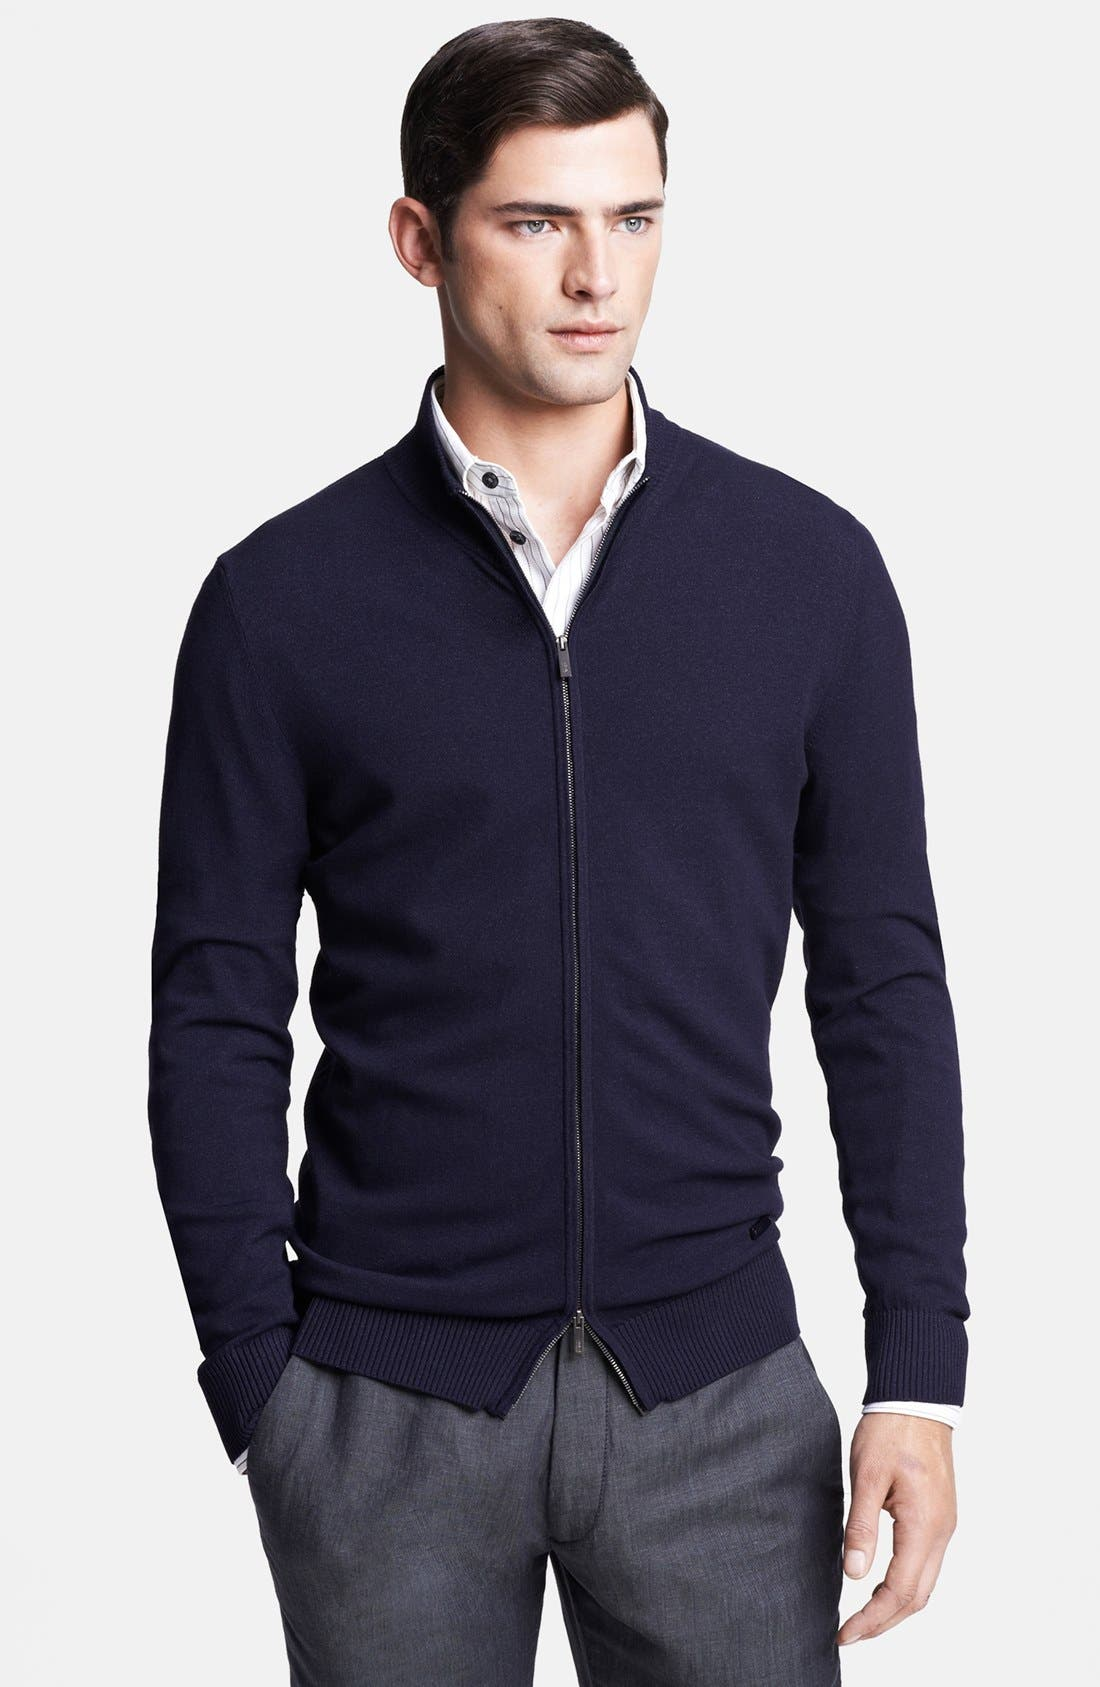 Alternate Image 1 Selected - Armani Collezioni Mock Neck Zip Sweater